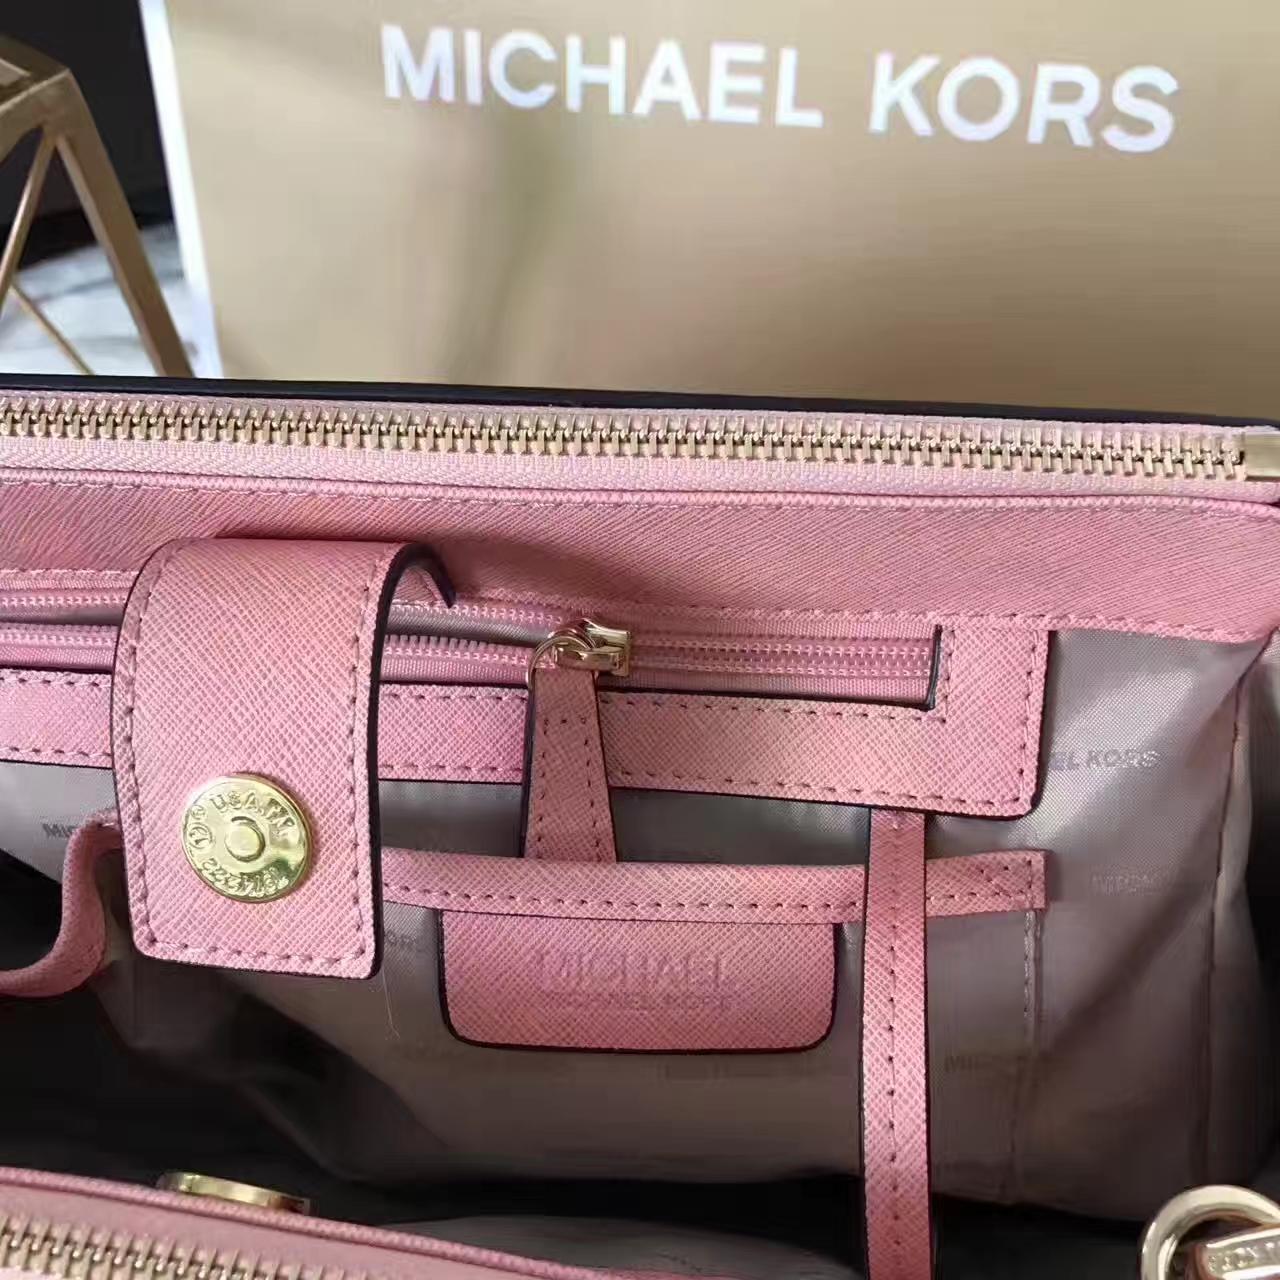 MK经典女包 迈克高仕原单十字纹牛皮双拉链MK杀手包中号32cm 粉色